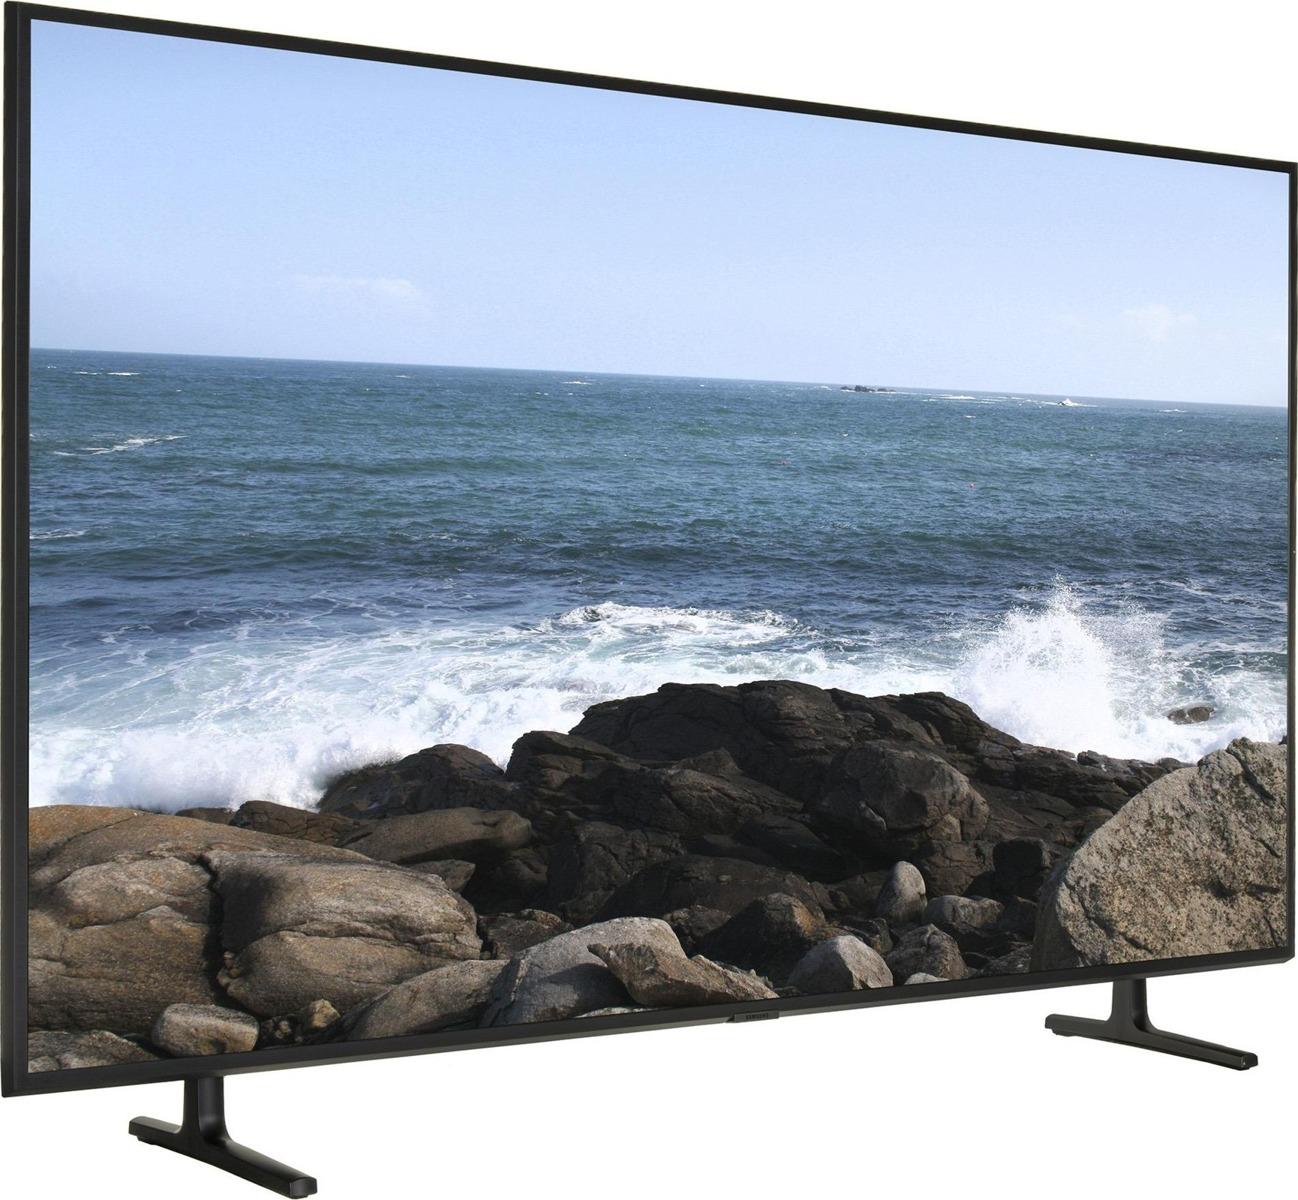 Samsung UE65RU8000U 4K UHD Smart TV HDR